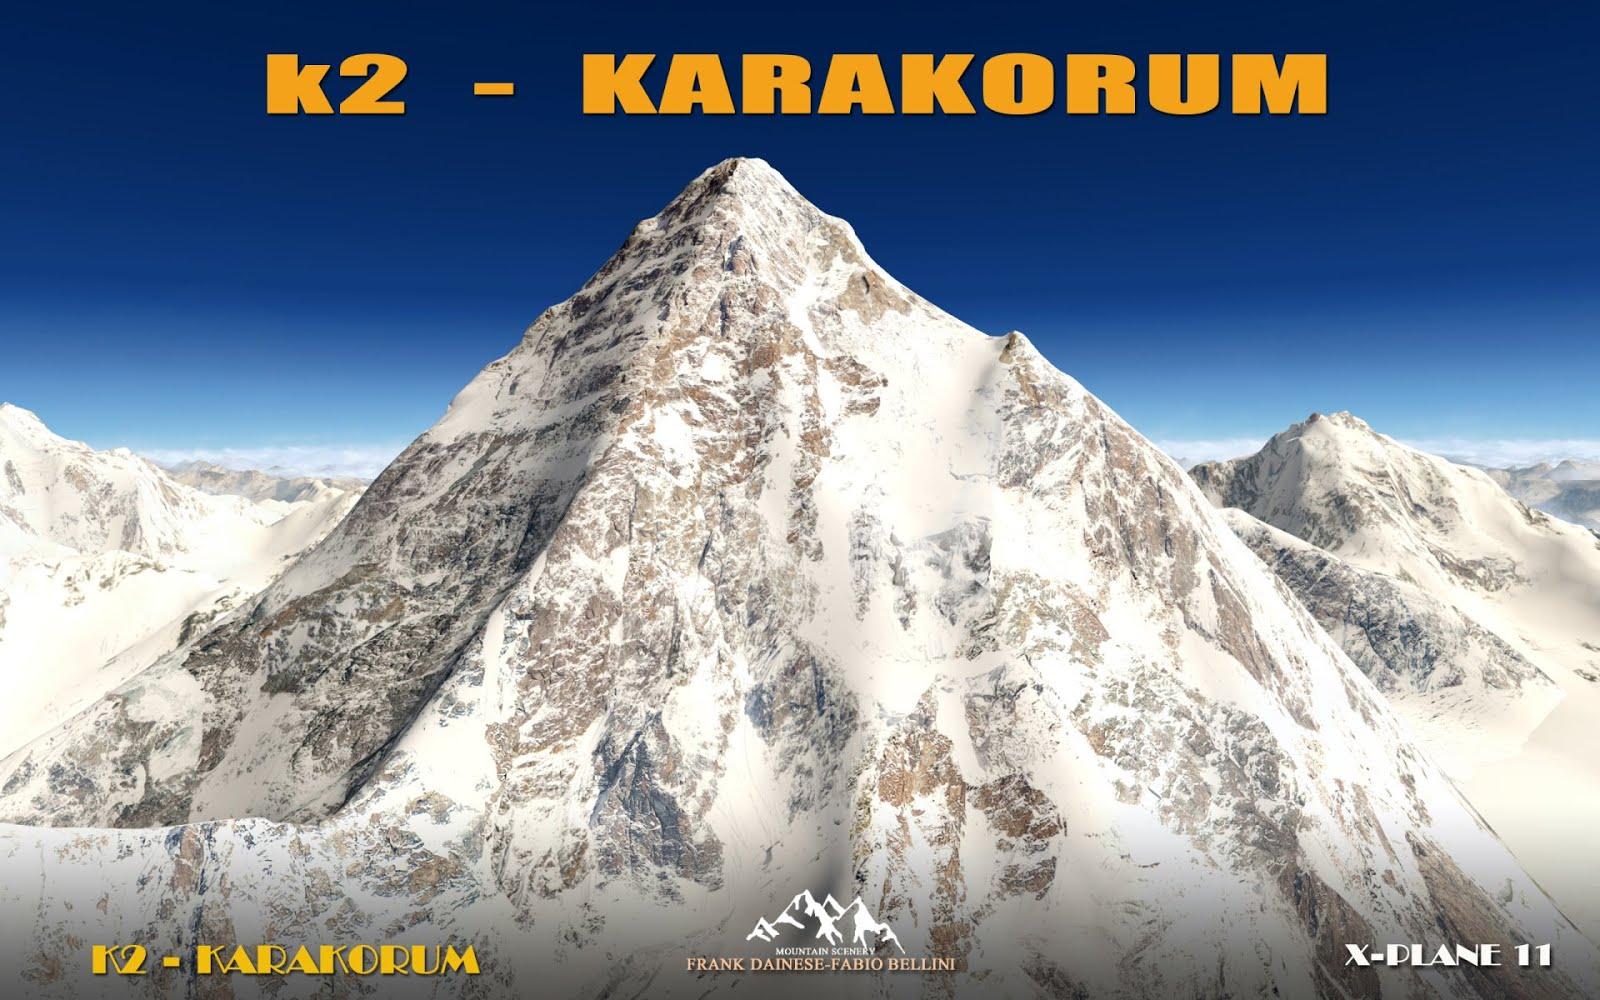 K2 - Karakorum